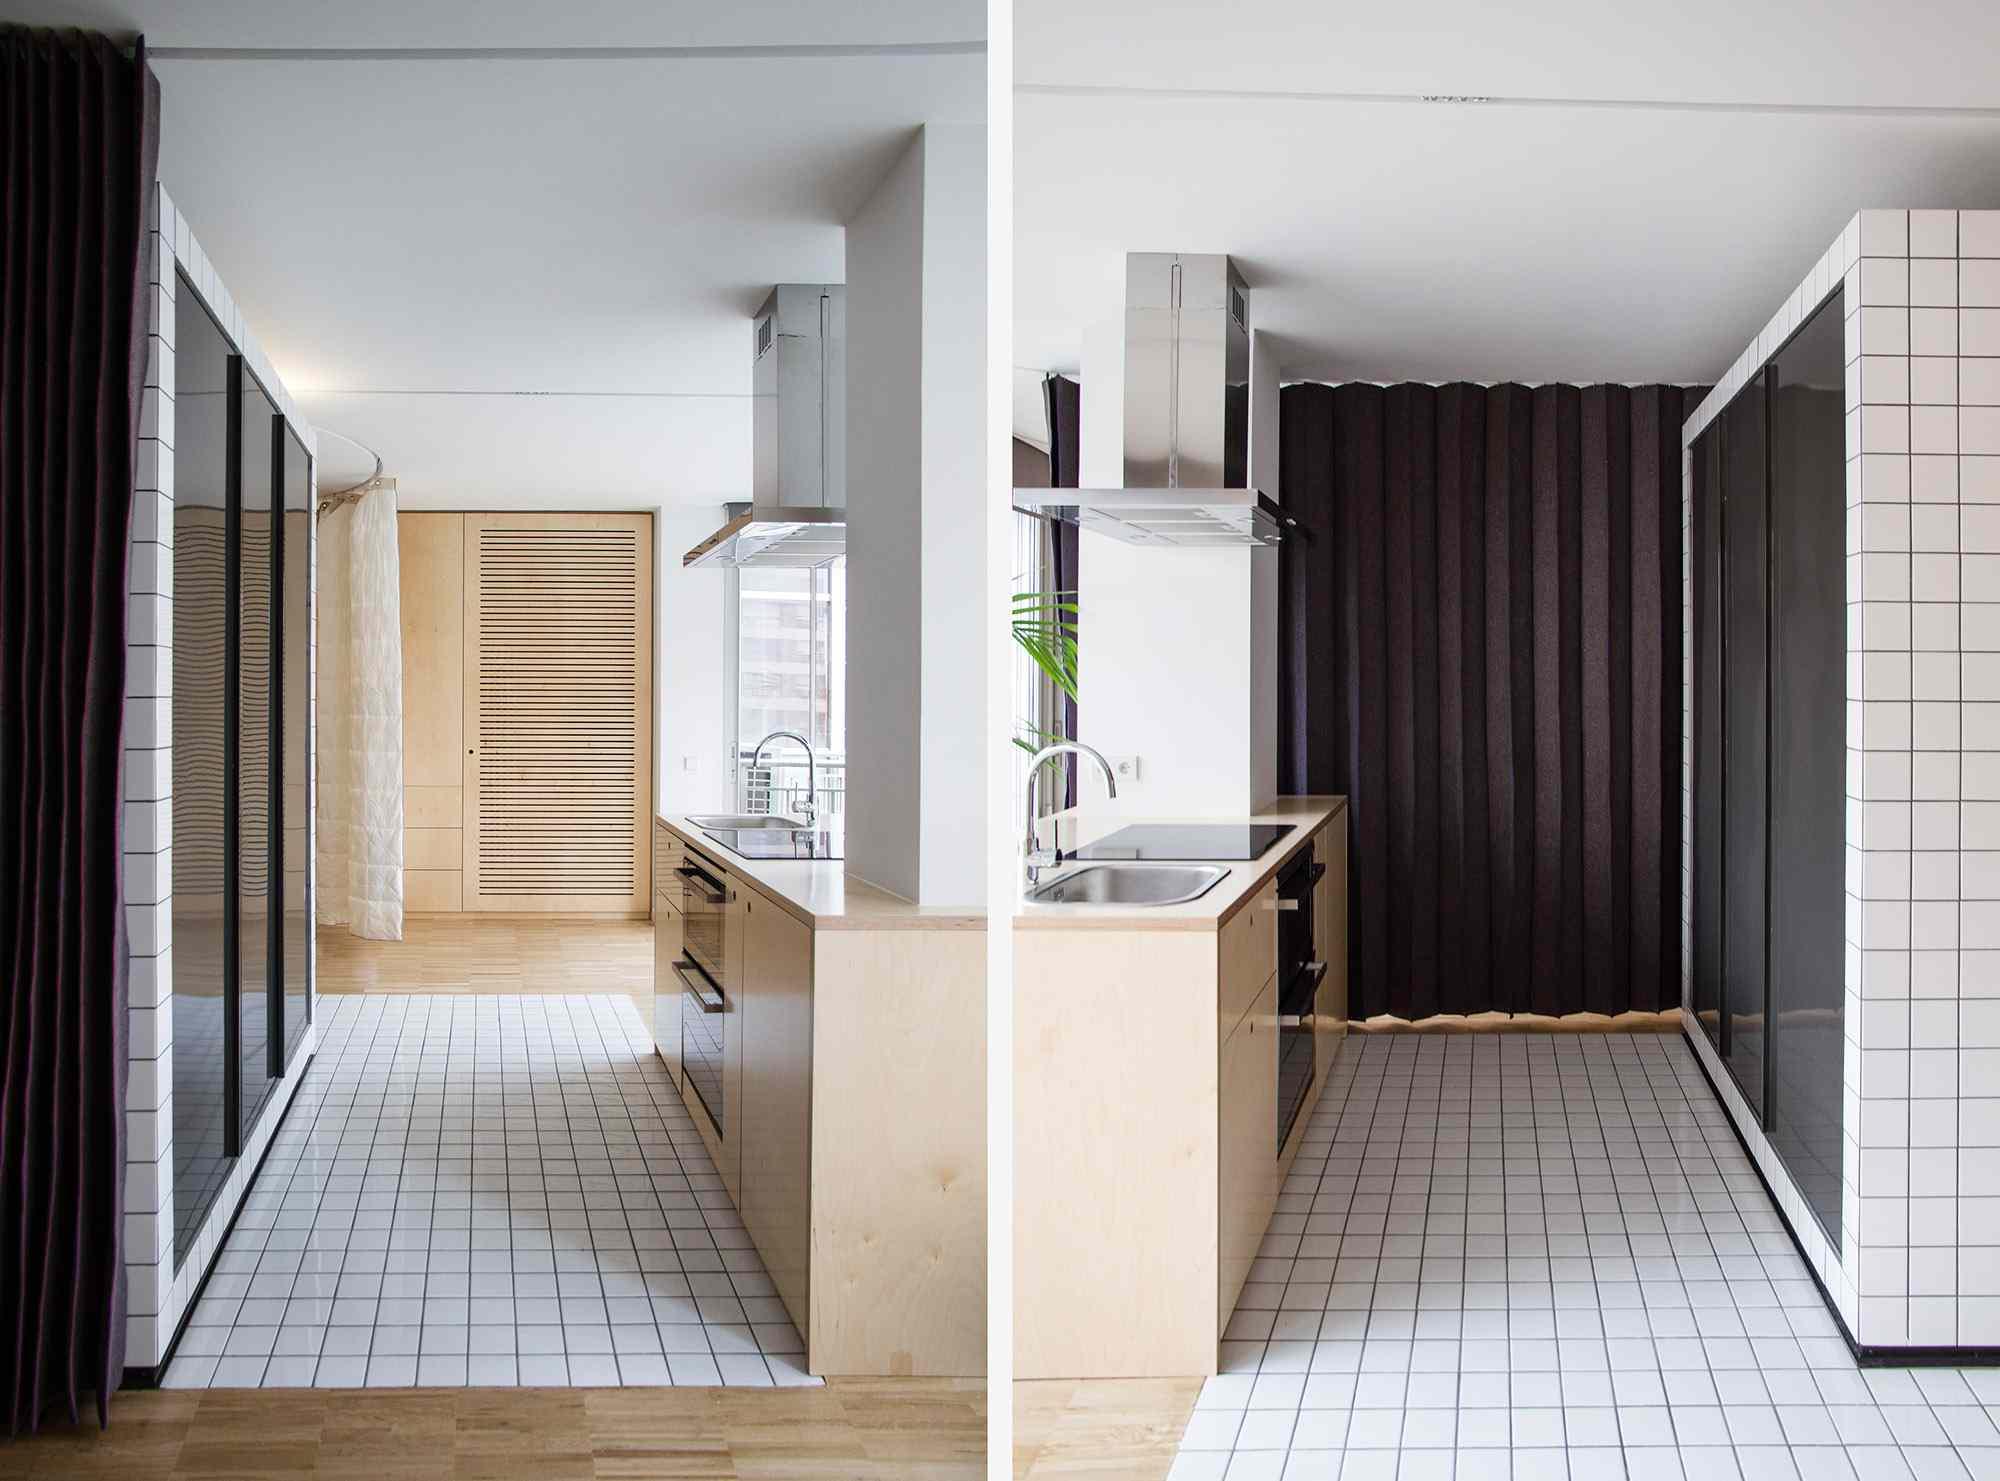 JM55 microapartment renovation by BURR Studio kitchen